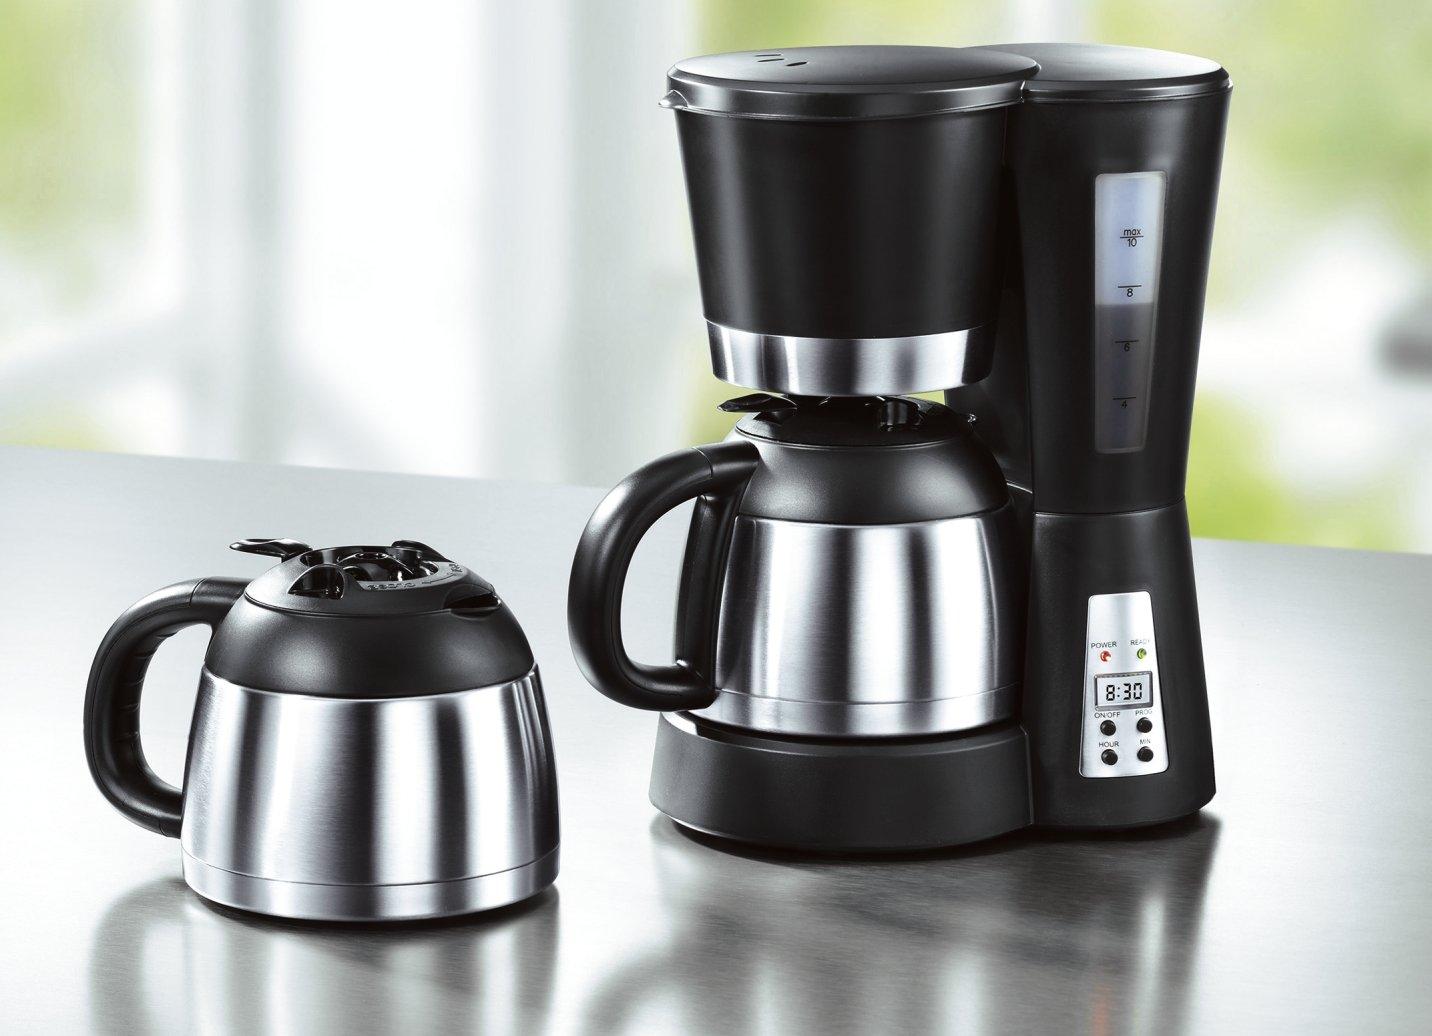 mia kaffeemaschine mit timer kaffee thermoskanne edelstahl filterkaffee ebay. Black Bedroom Furniture Sets. Home Design Ideas